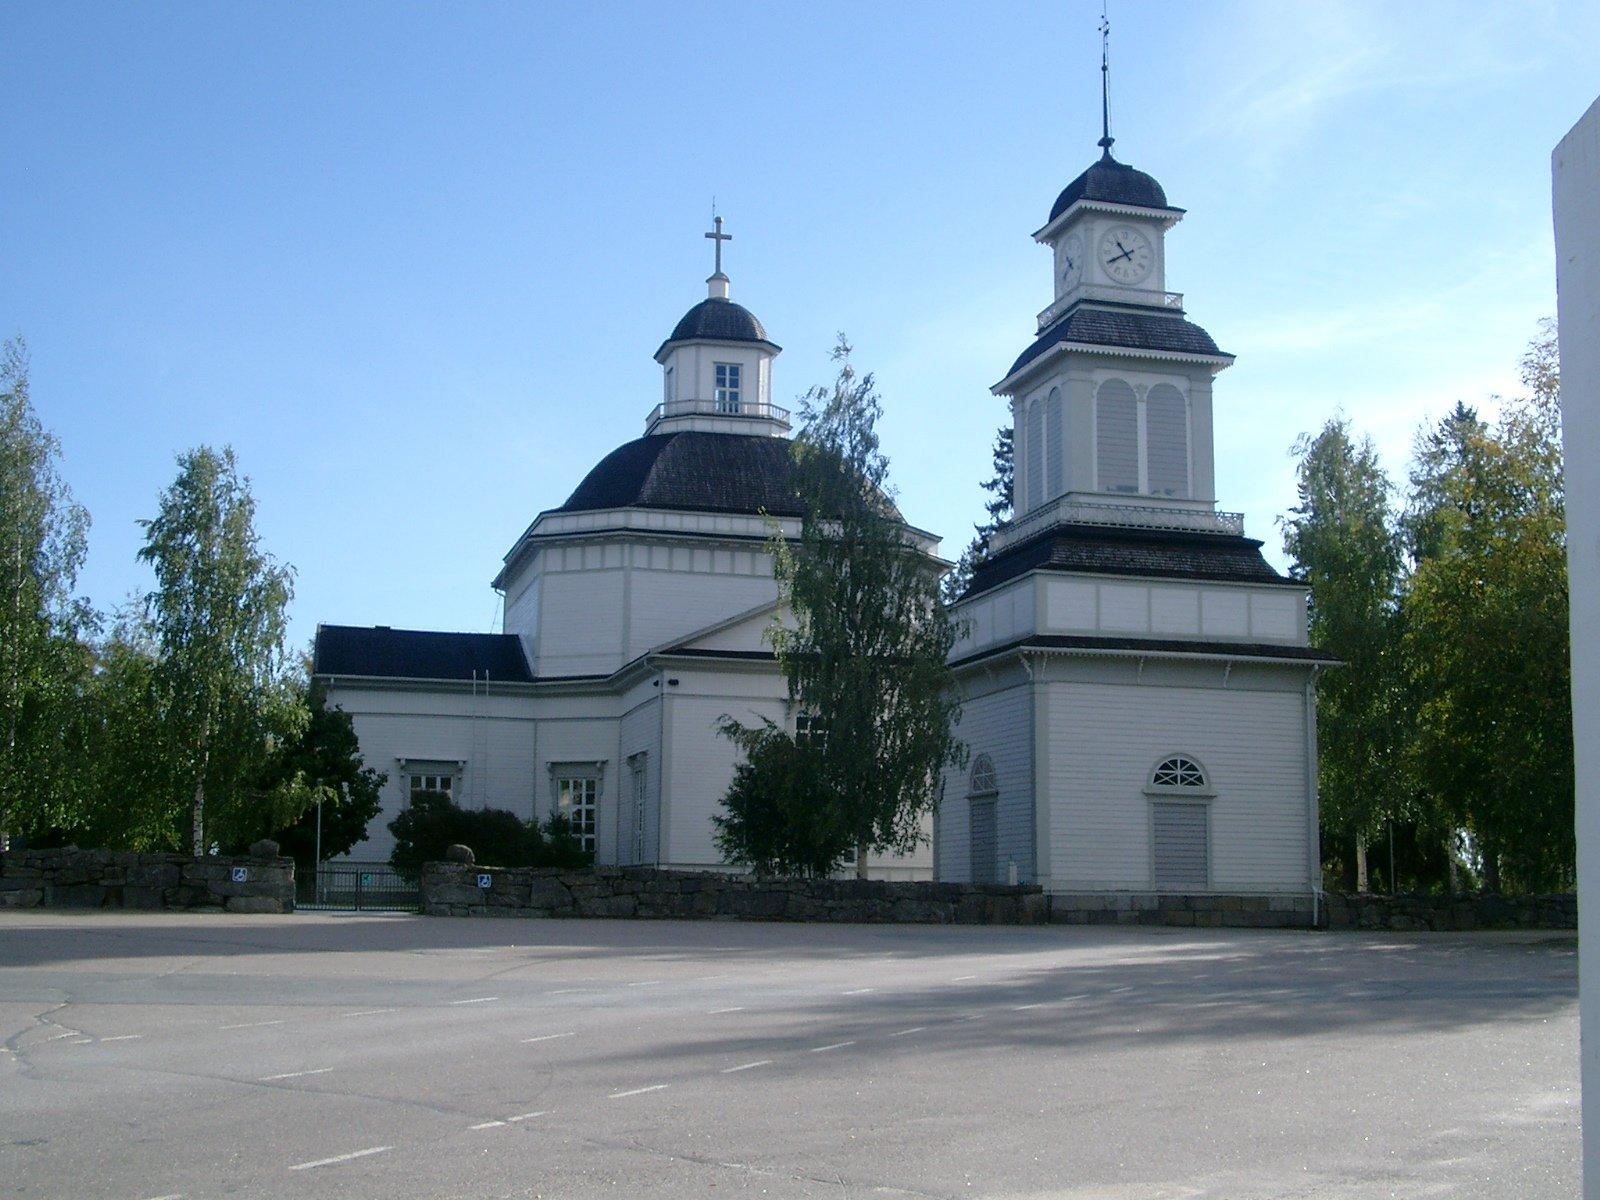 Alajärven Gabrielin kirkko